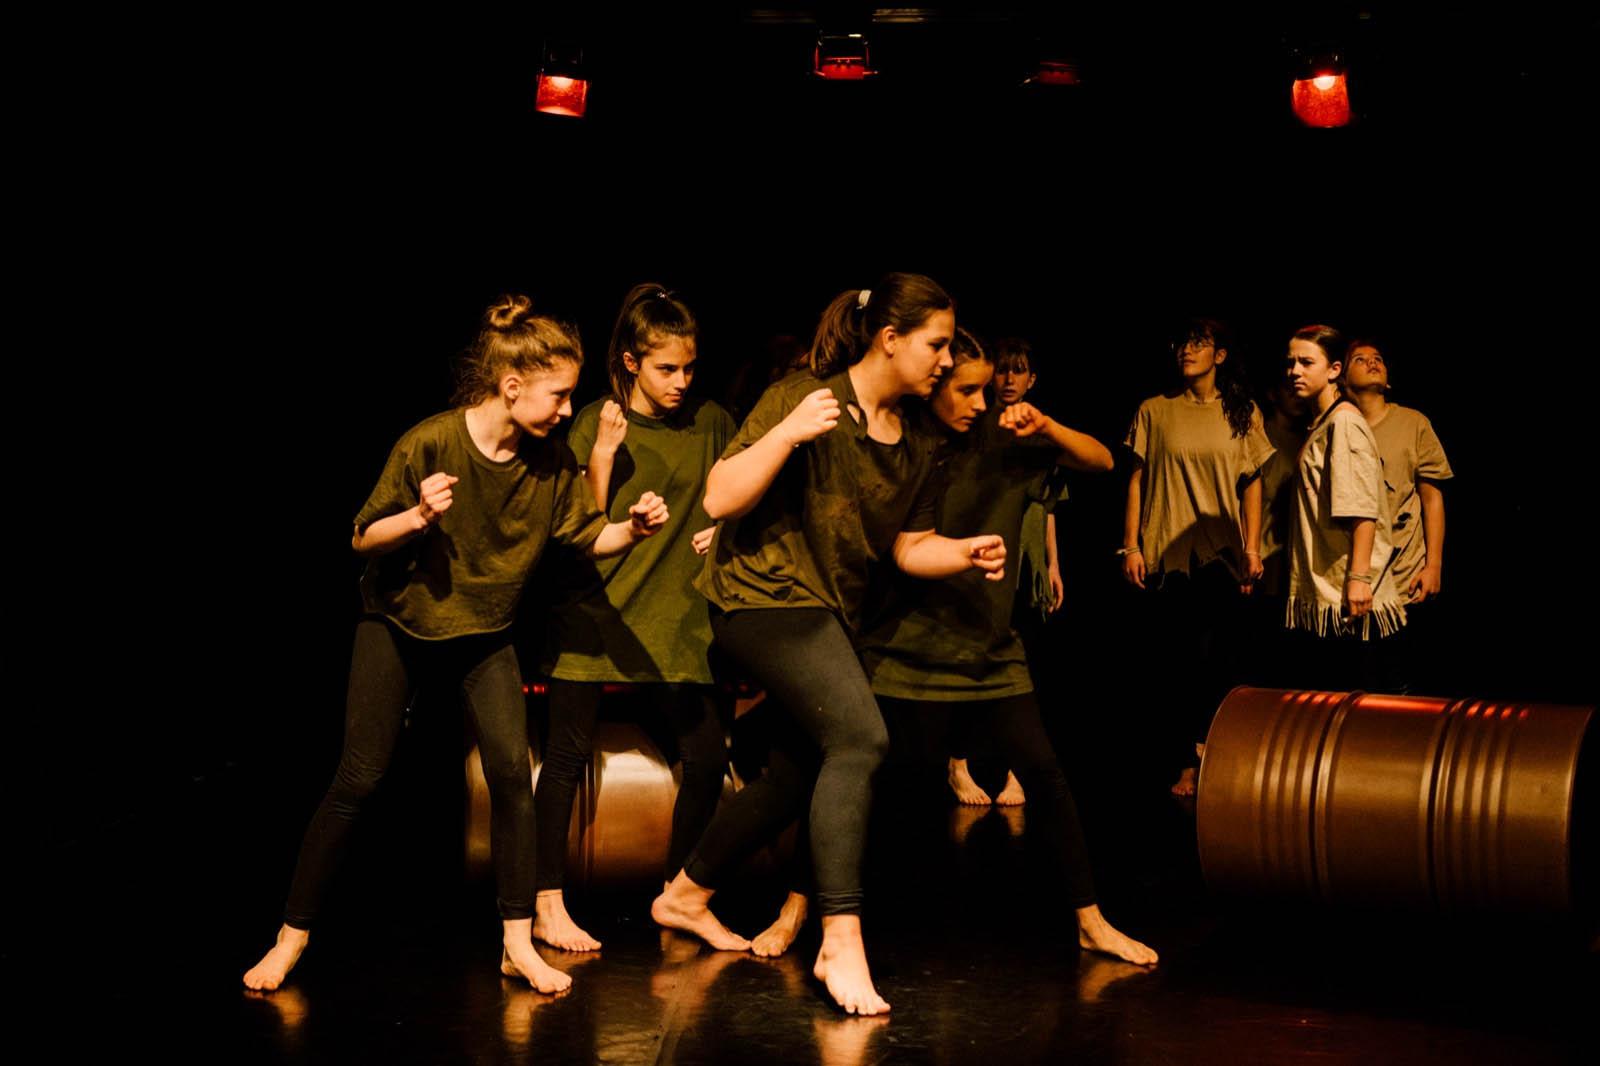 Gestrandet - Theaterwerkstatt ZINNOBER - TPZ Brixen9. Mai um 19:30 Uhr im JUKAS Brixen